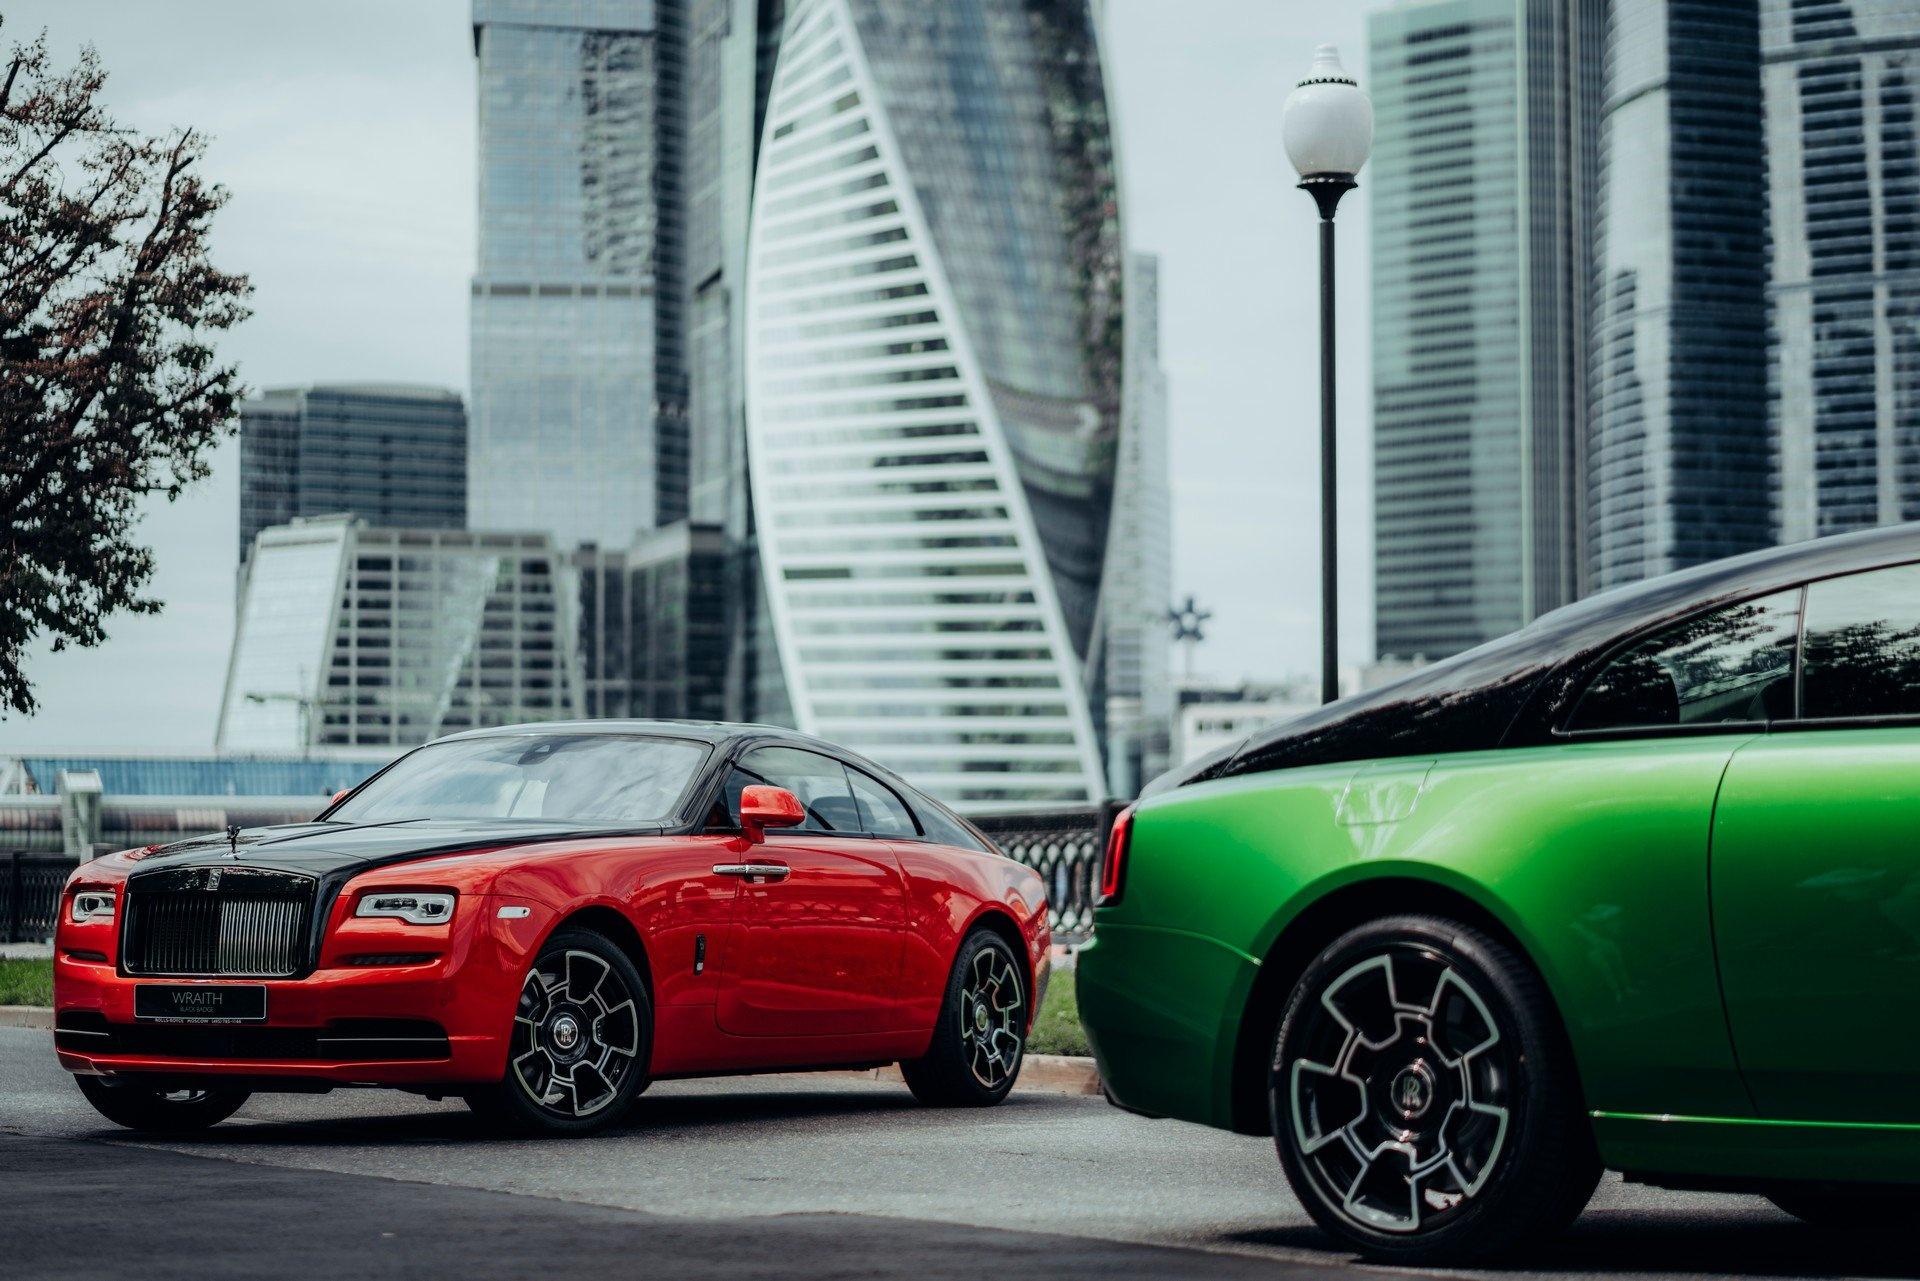 Ngam bo suu tap Rolls-Royce dac biet 'Dem Moscow' hinh anh 1